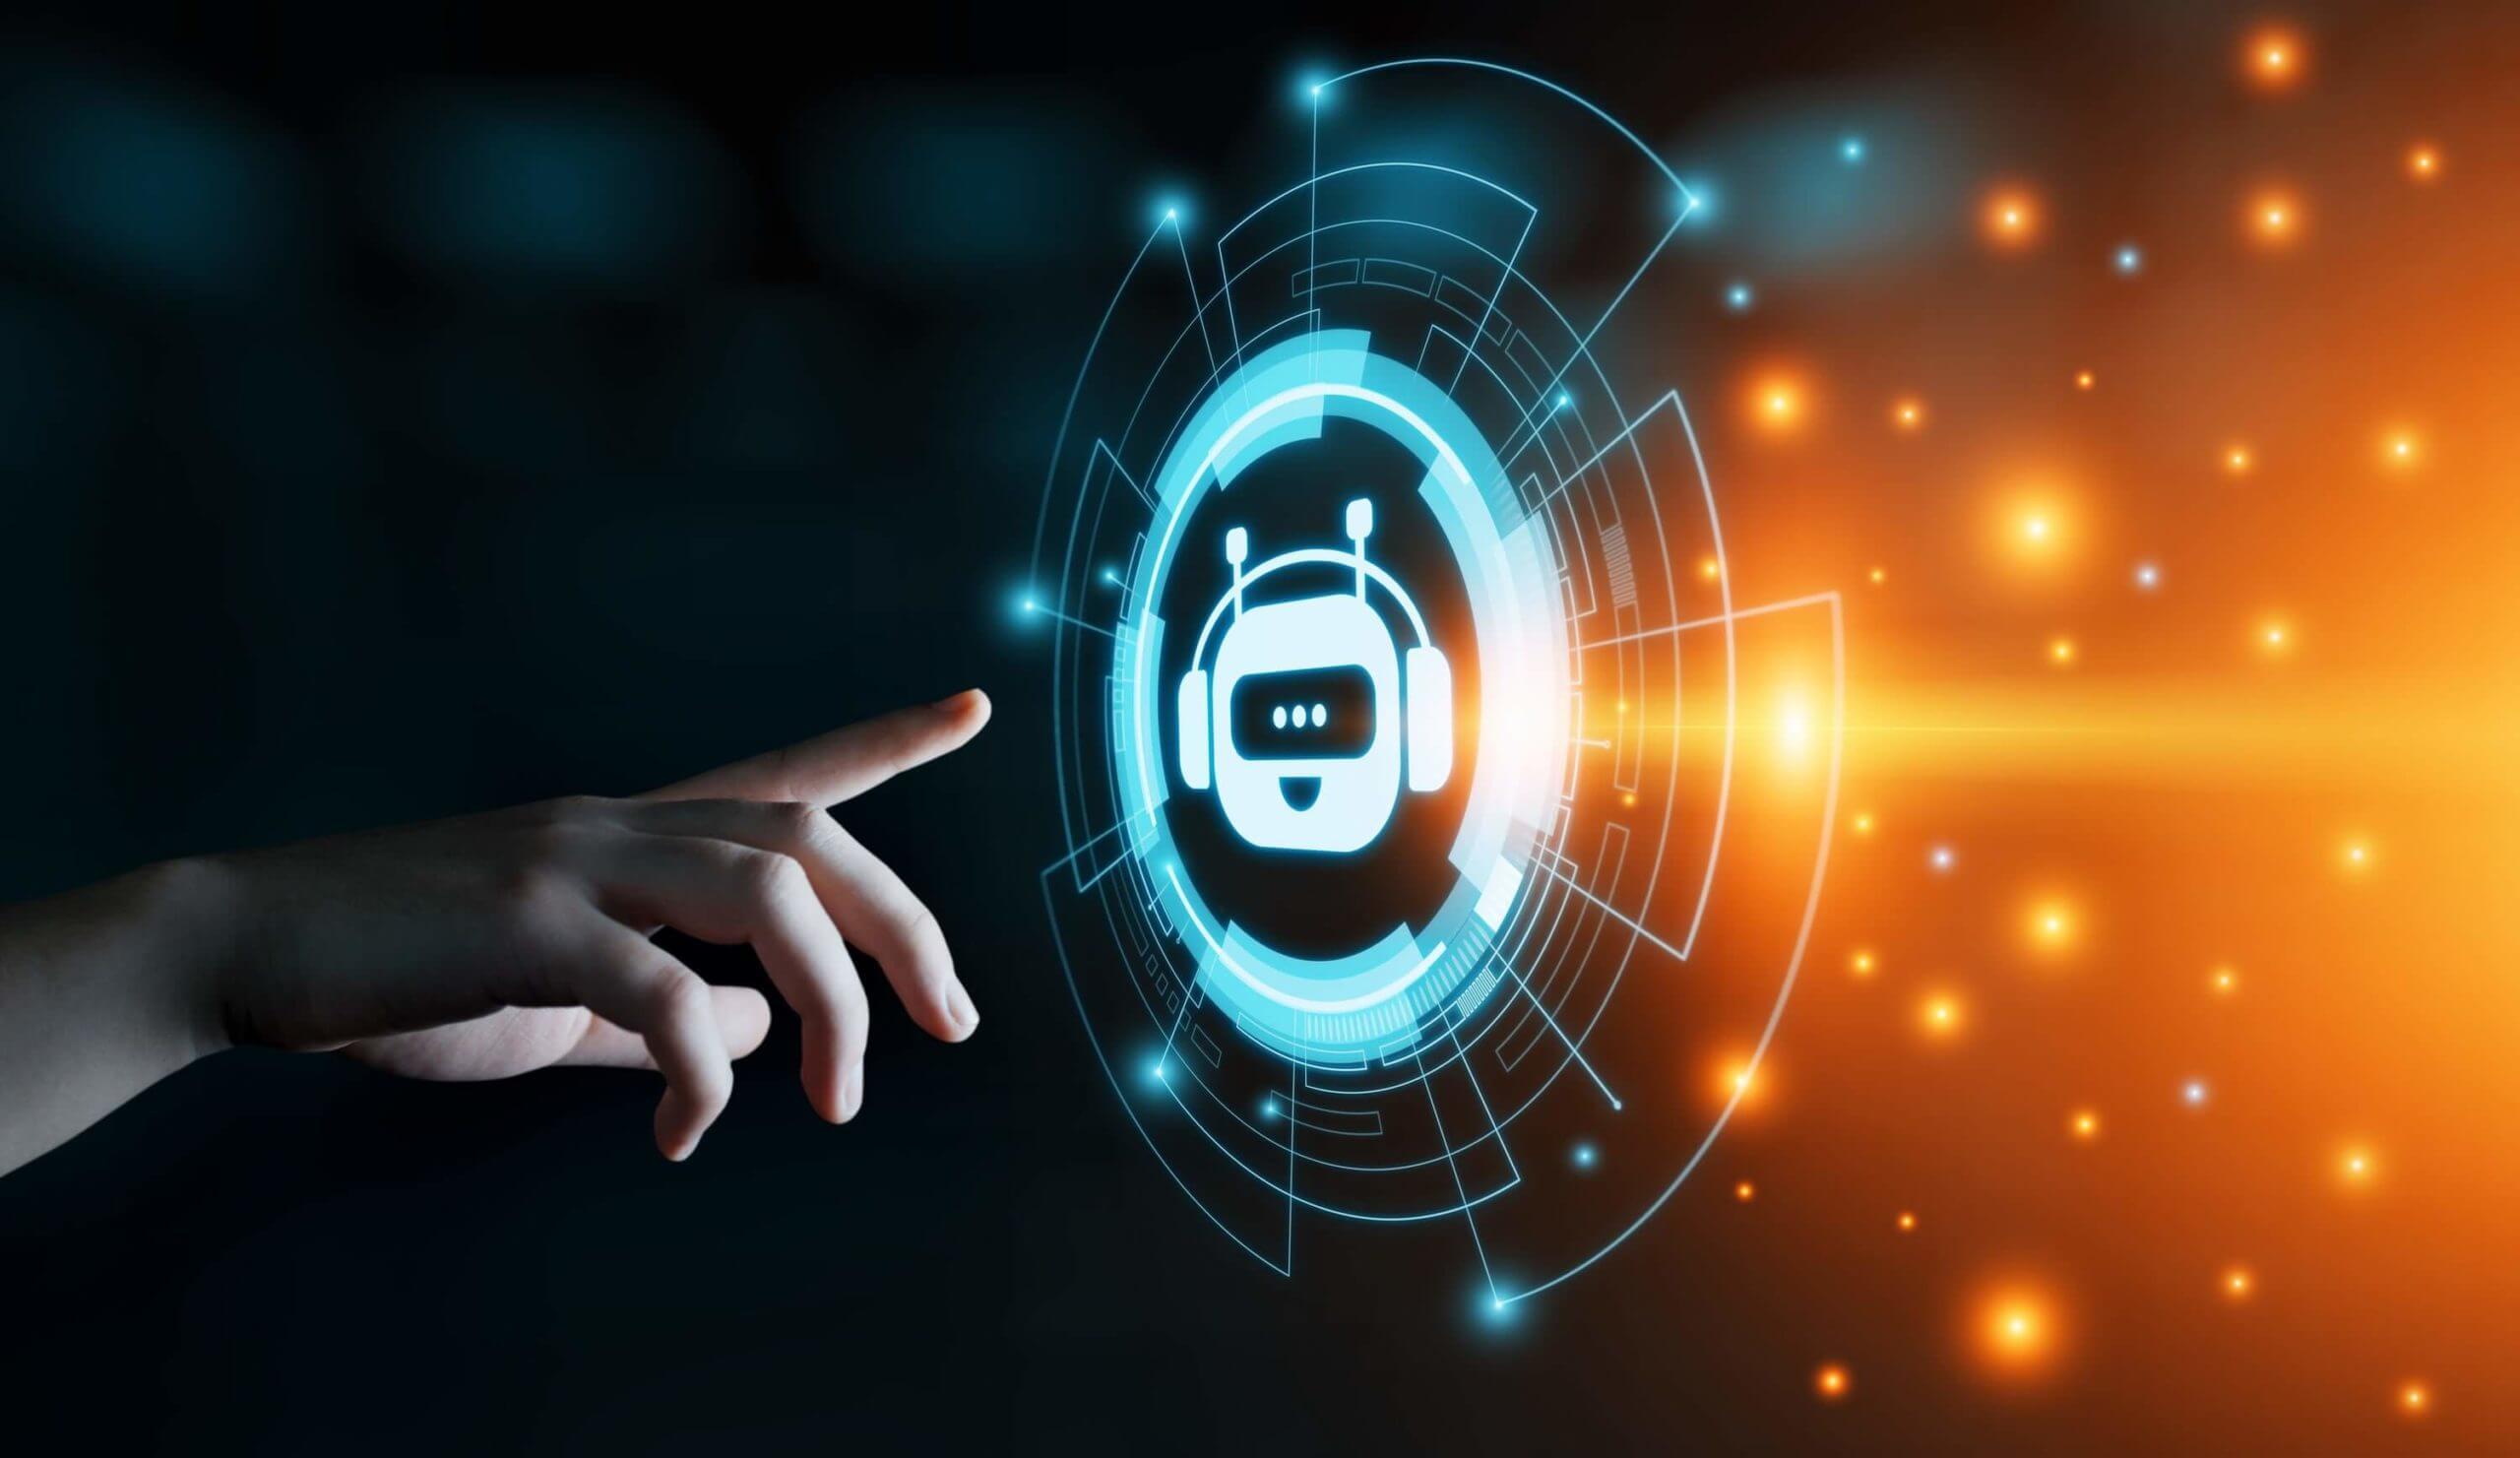 Creating a сhatbot: 4 main challenges